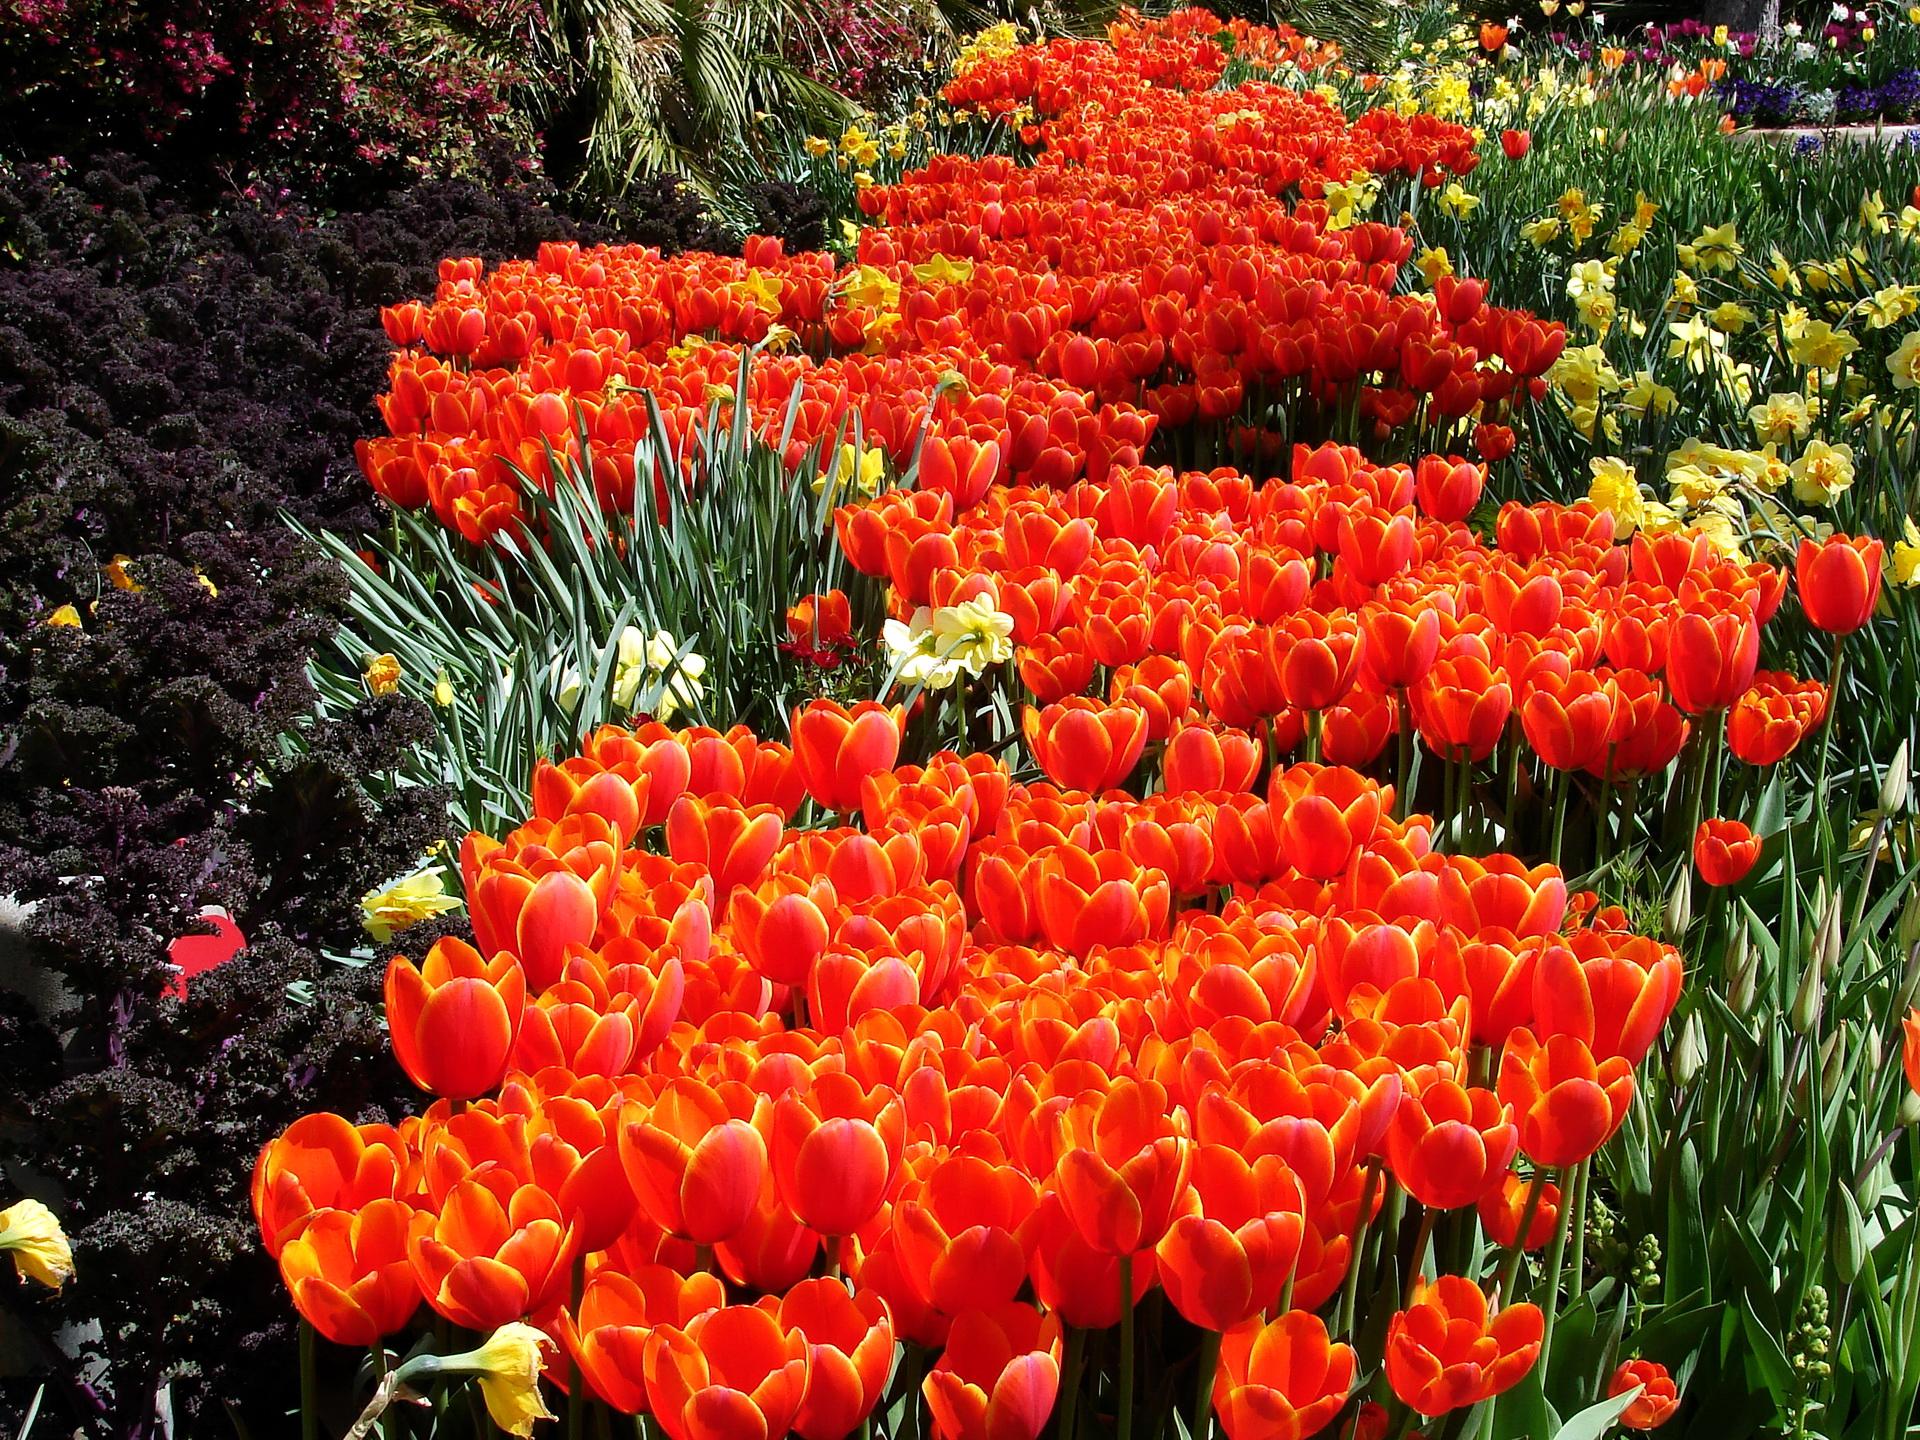 тюльпаны клумба  № 1349336 бесплатно